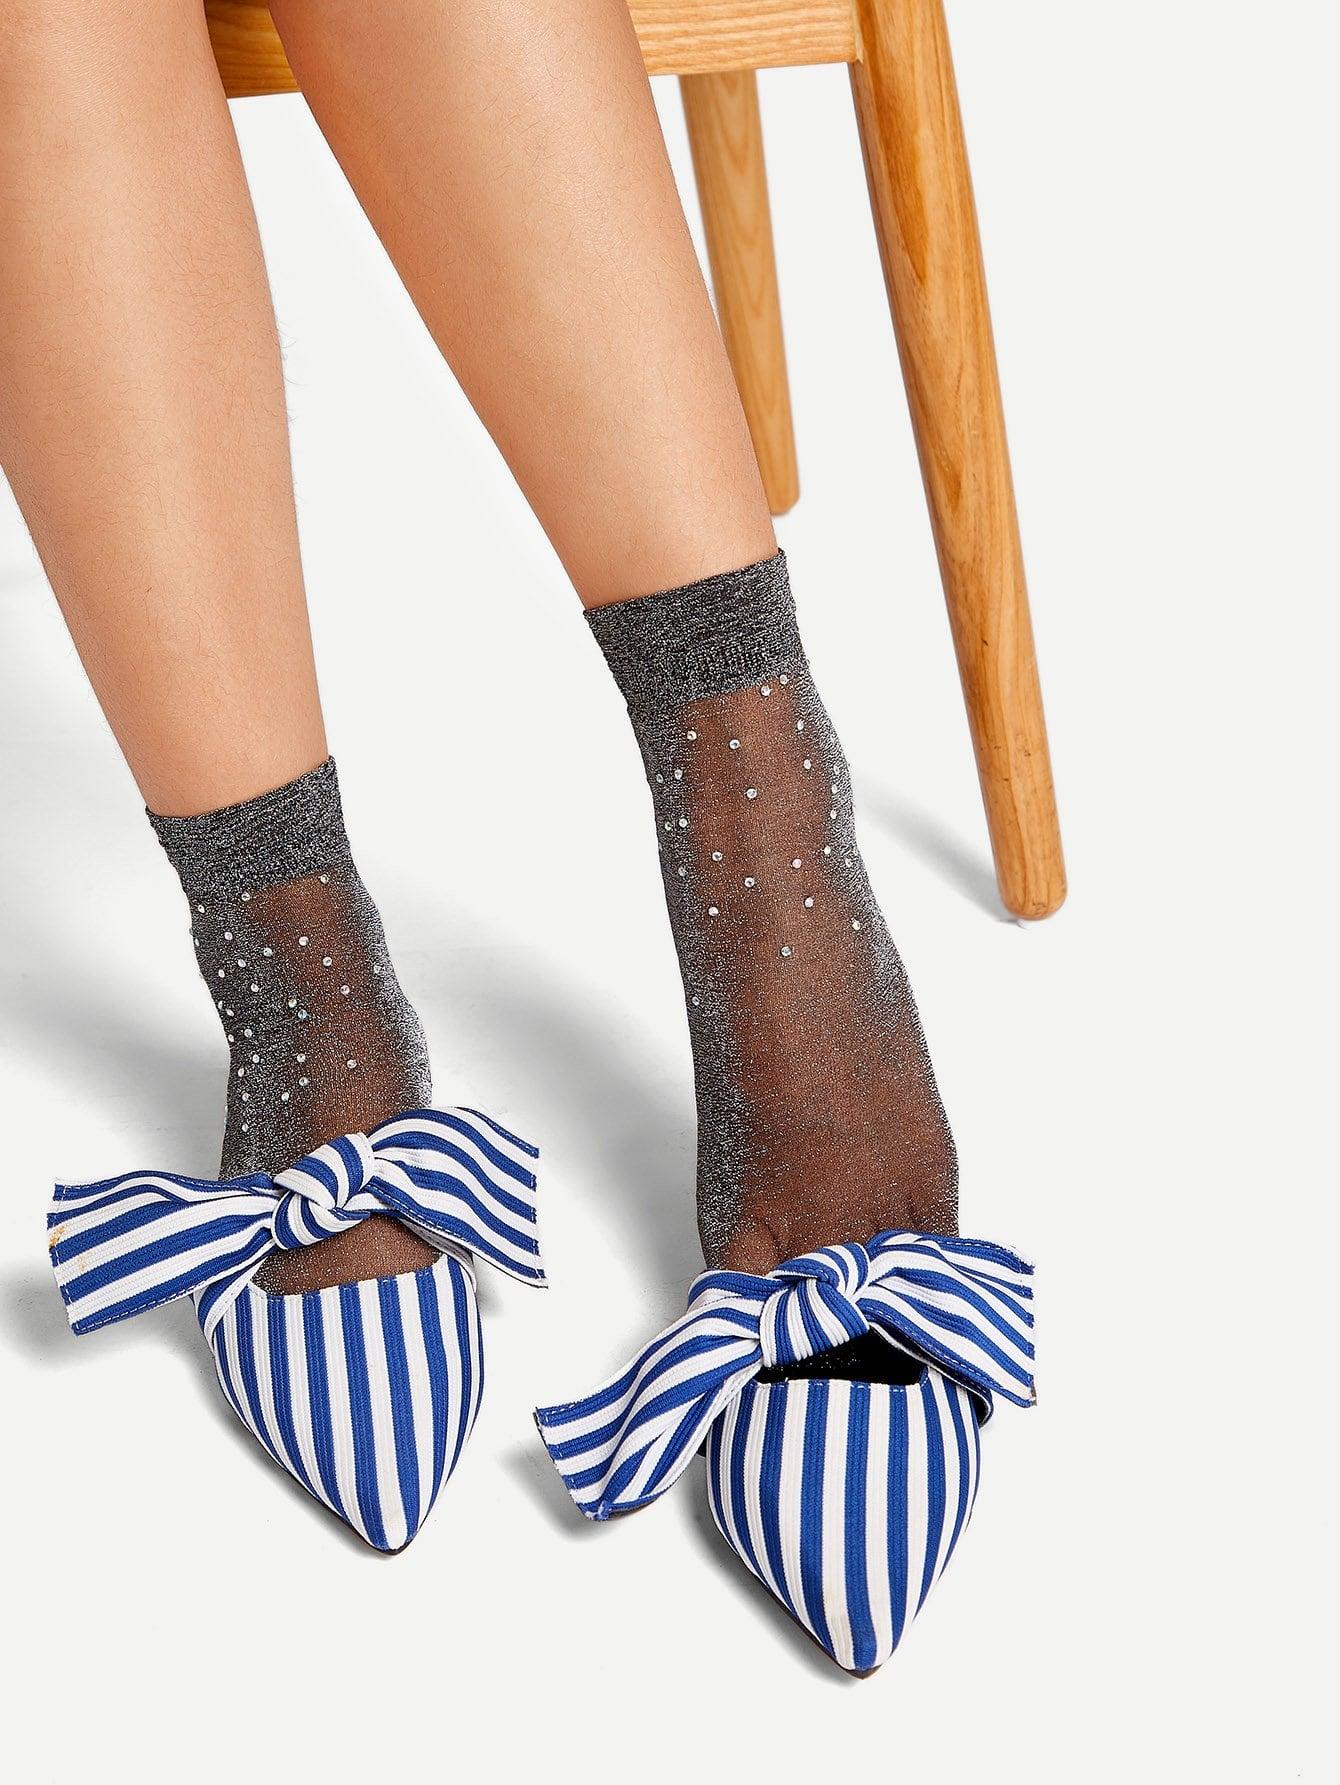 1 пара носки украшенный горный хрусталь